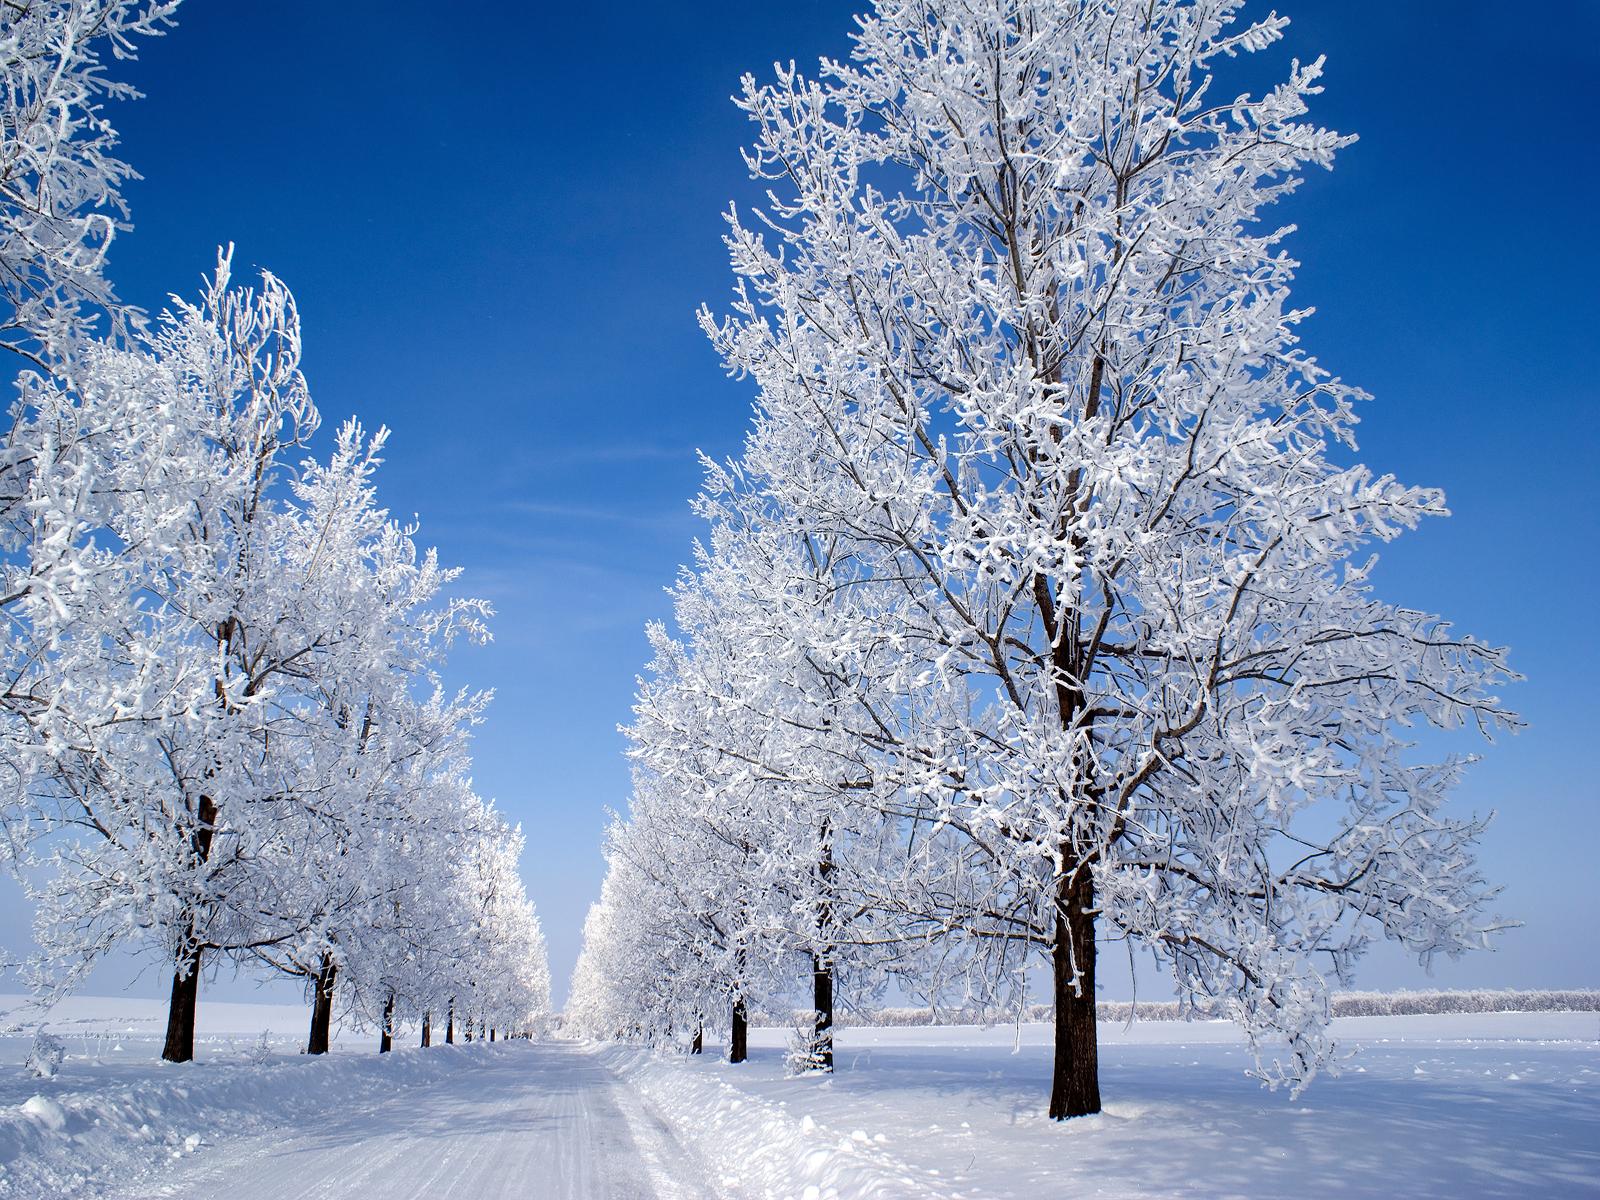 winter snow wallpaper 1600x1200